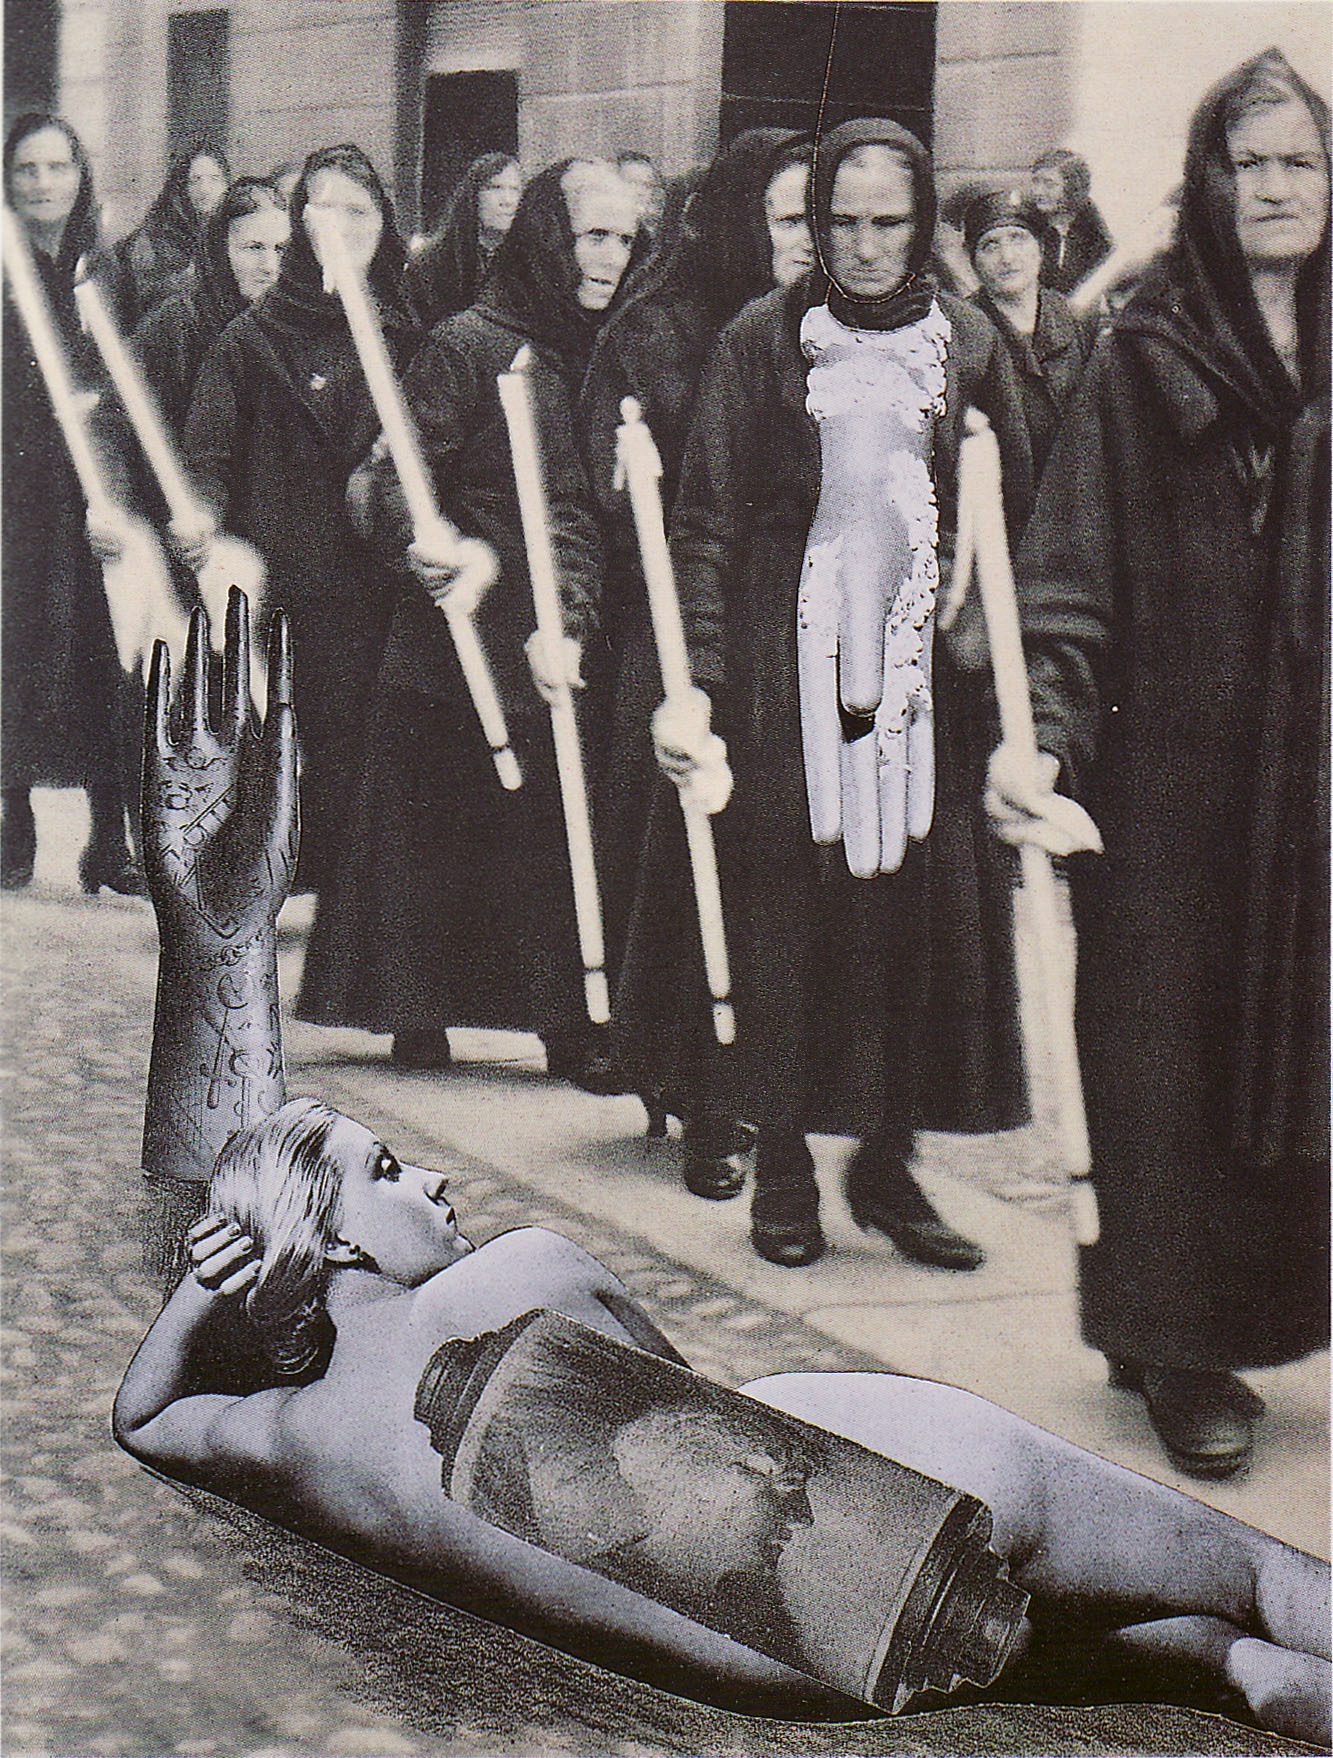 Karel Teige-Collage# 288, 1943. (c) Nachlass Karel Teige